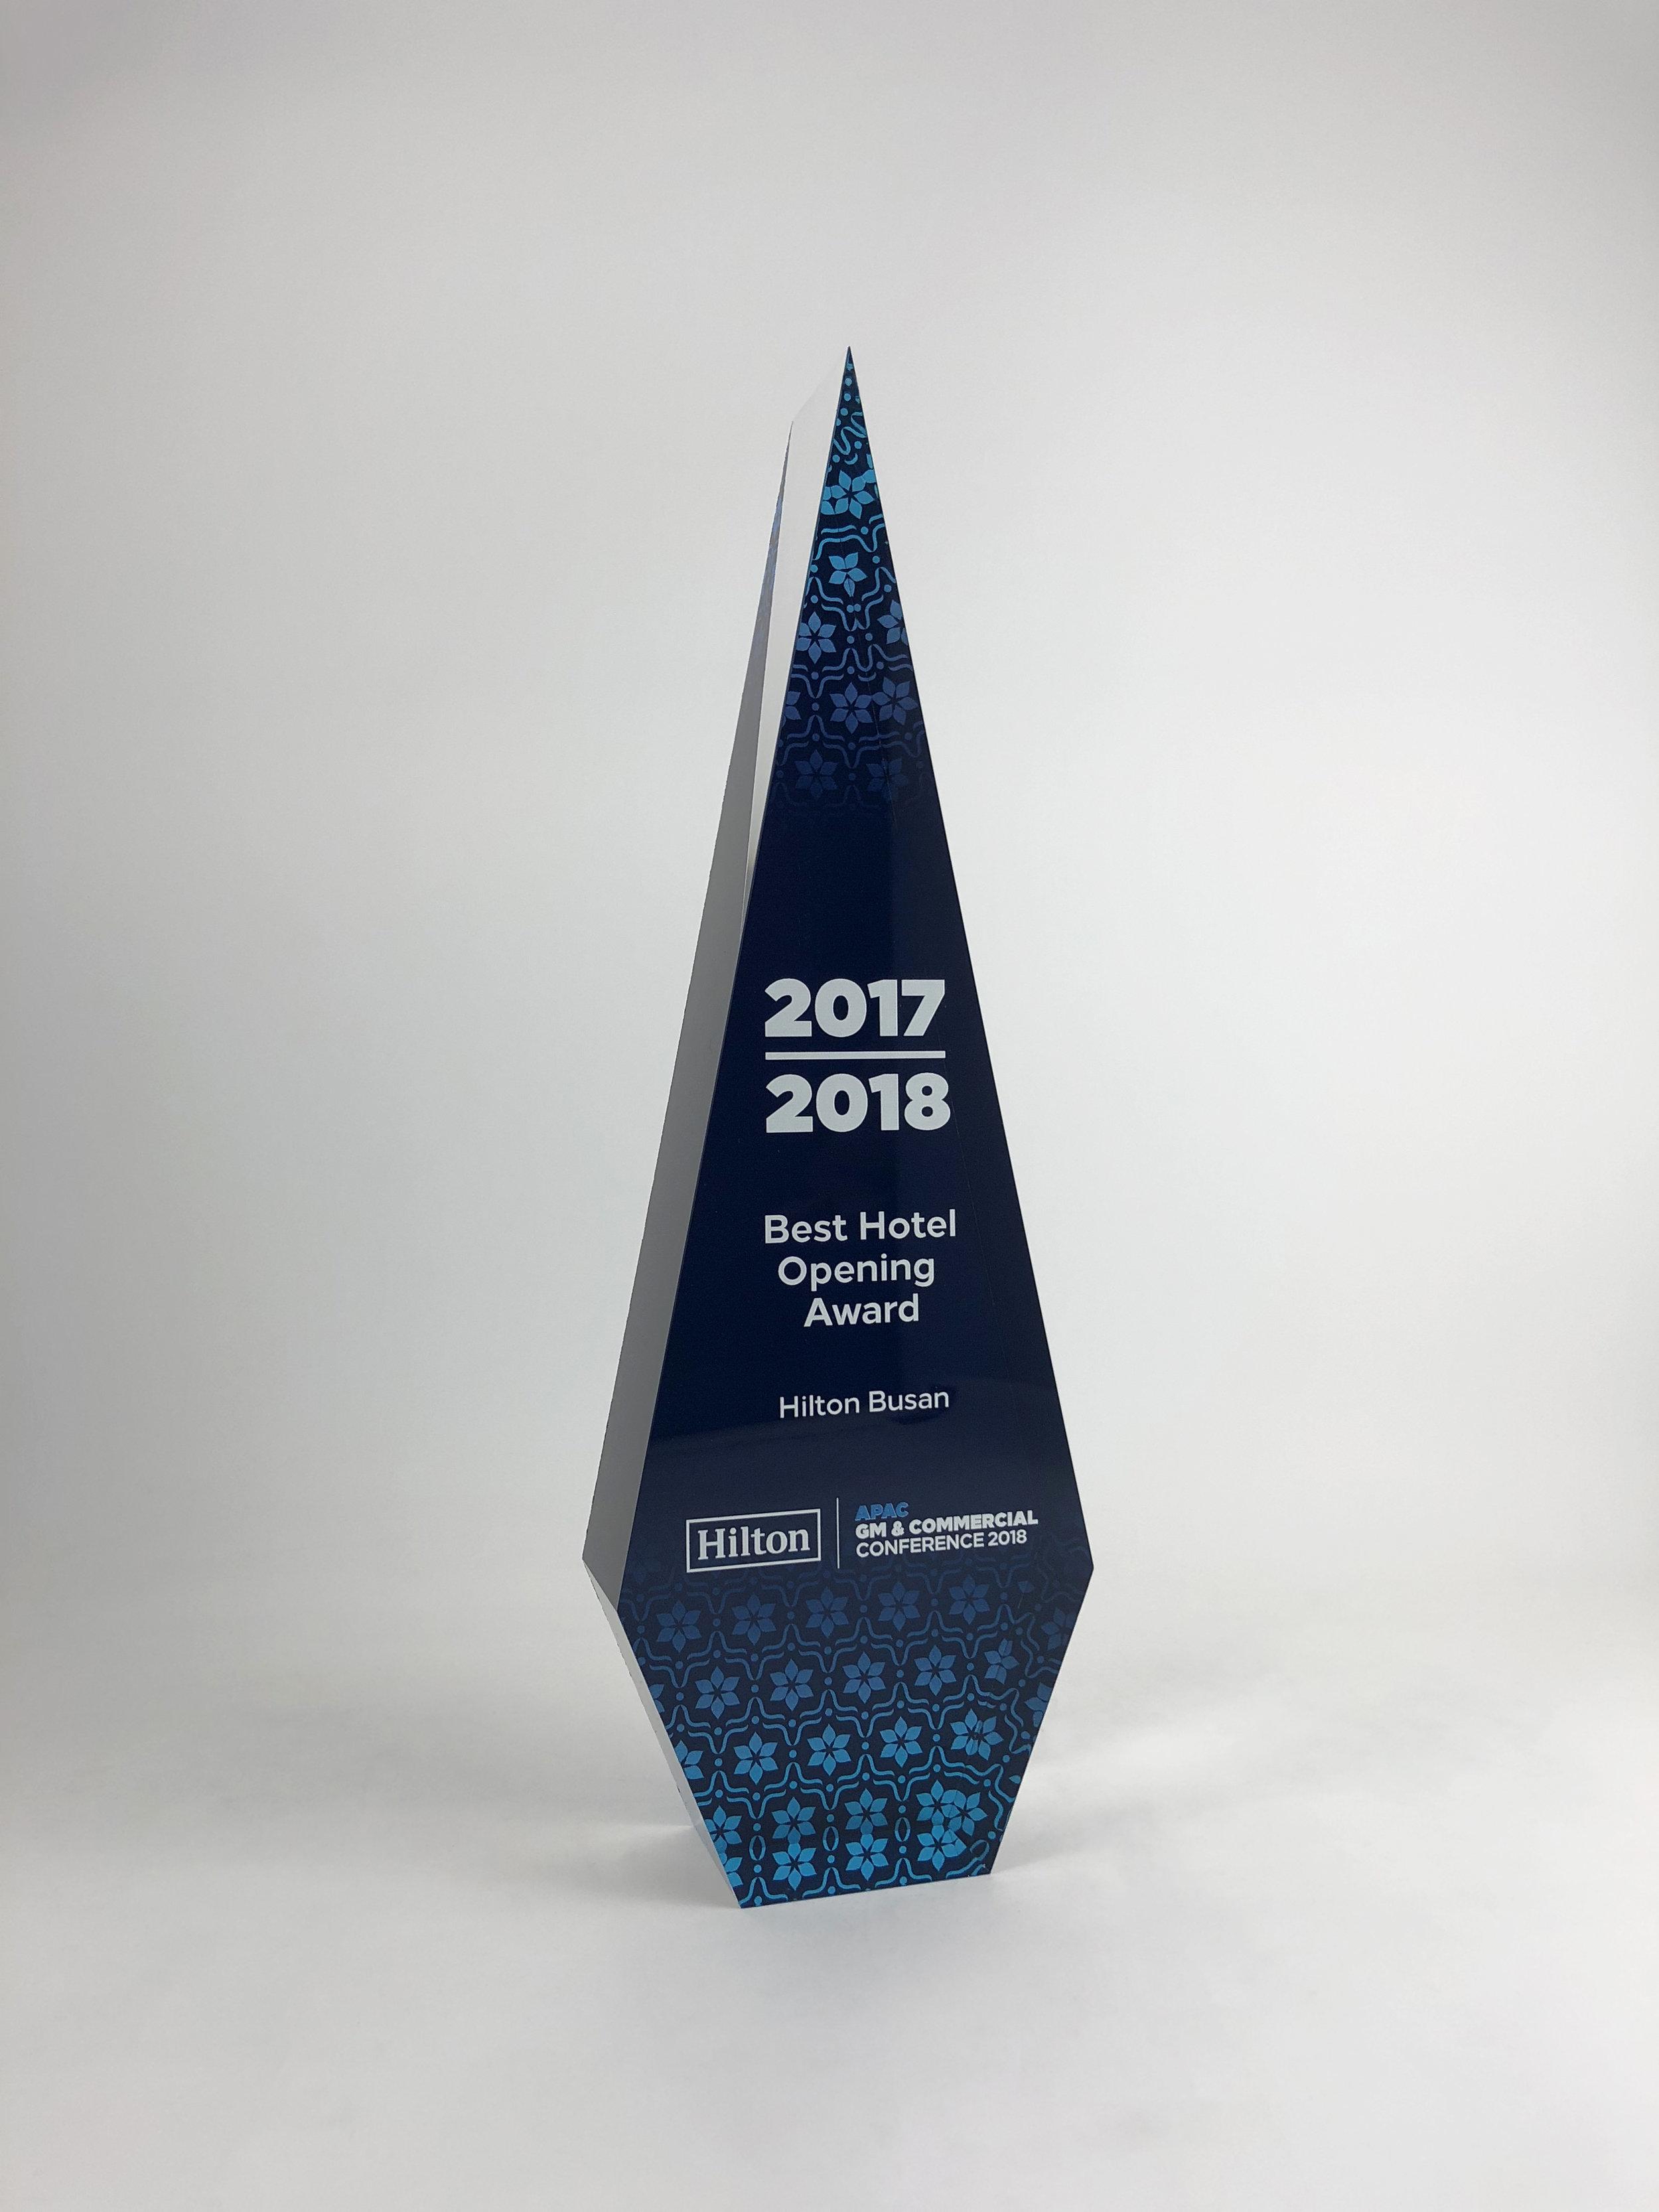 hilton-apac-awards-acrylic-trophy-04.jpg